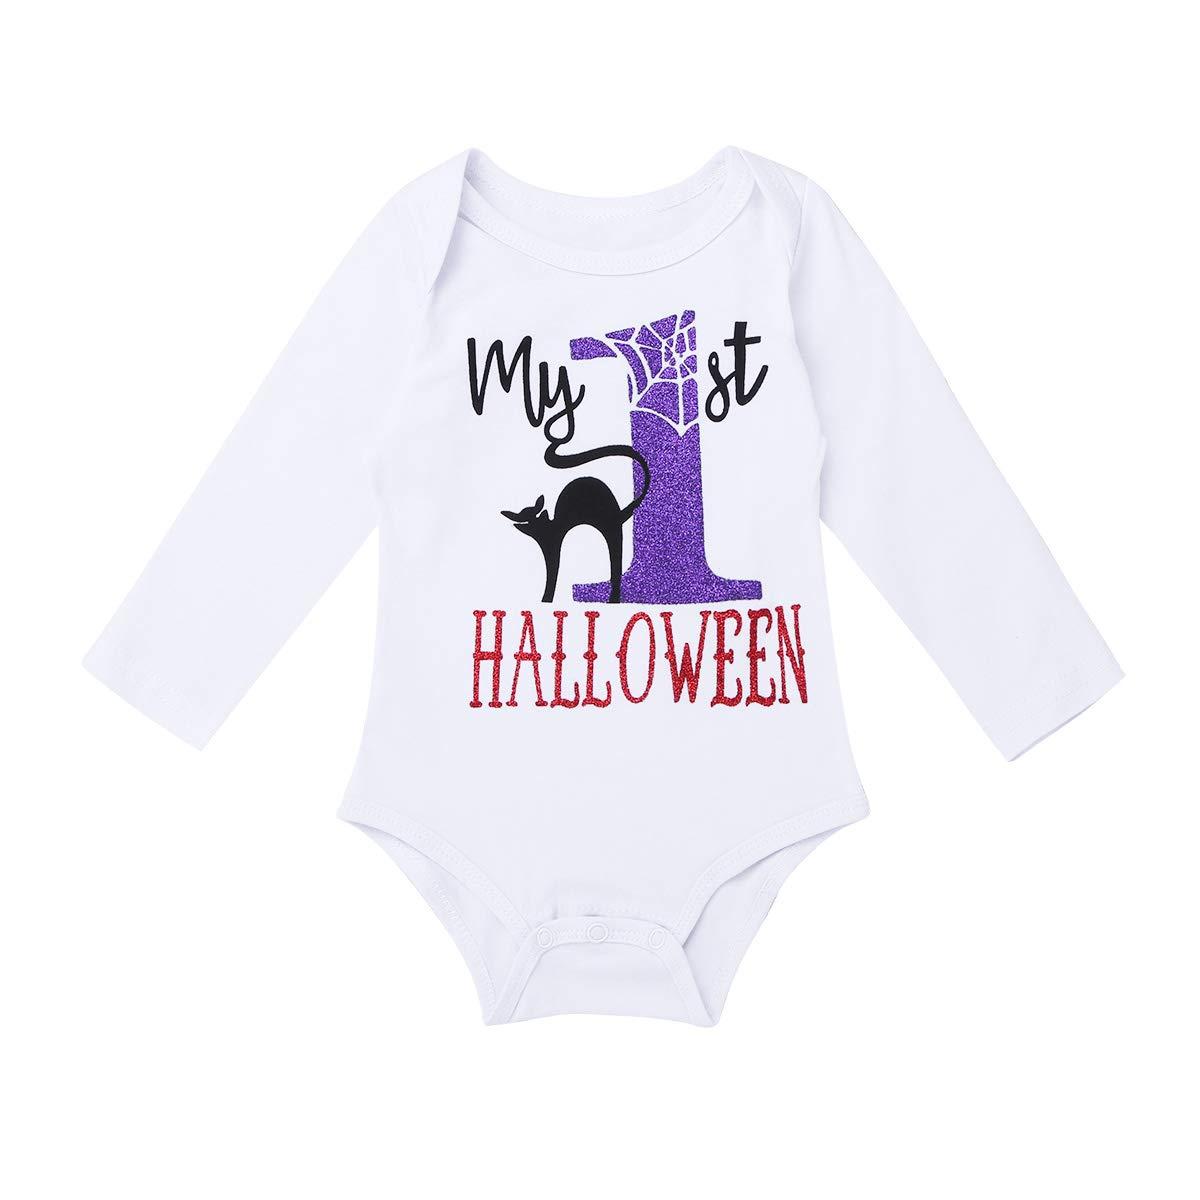 FEESHOW Baby Girls My 1st Halloween Outfit Costumes Romper Bodysuit Tutu Skirt Headband Set Black 5 pcs Set 0-3 Months by FEESHOW (Image #3)